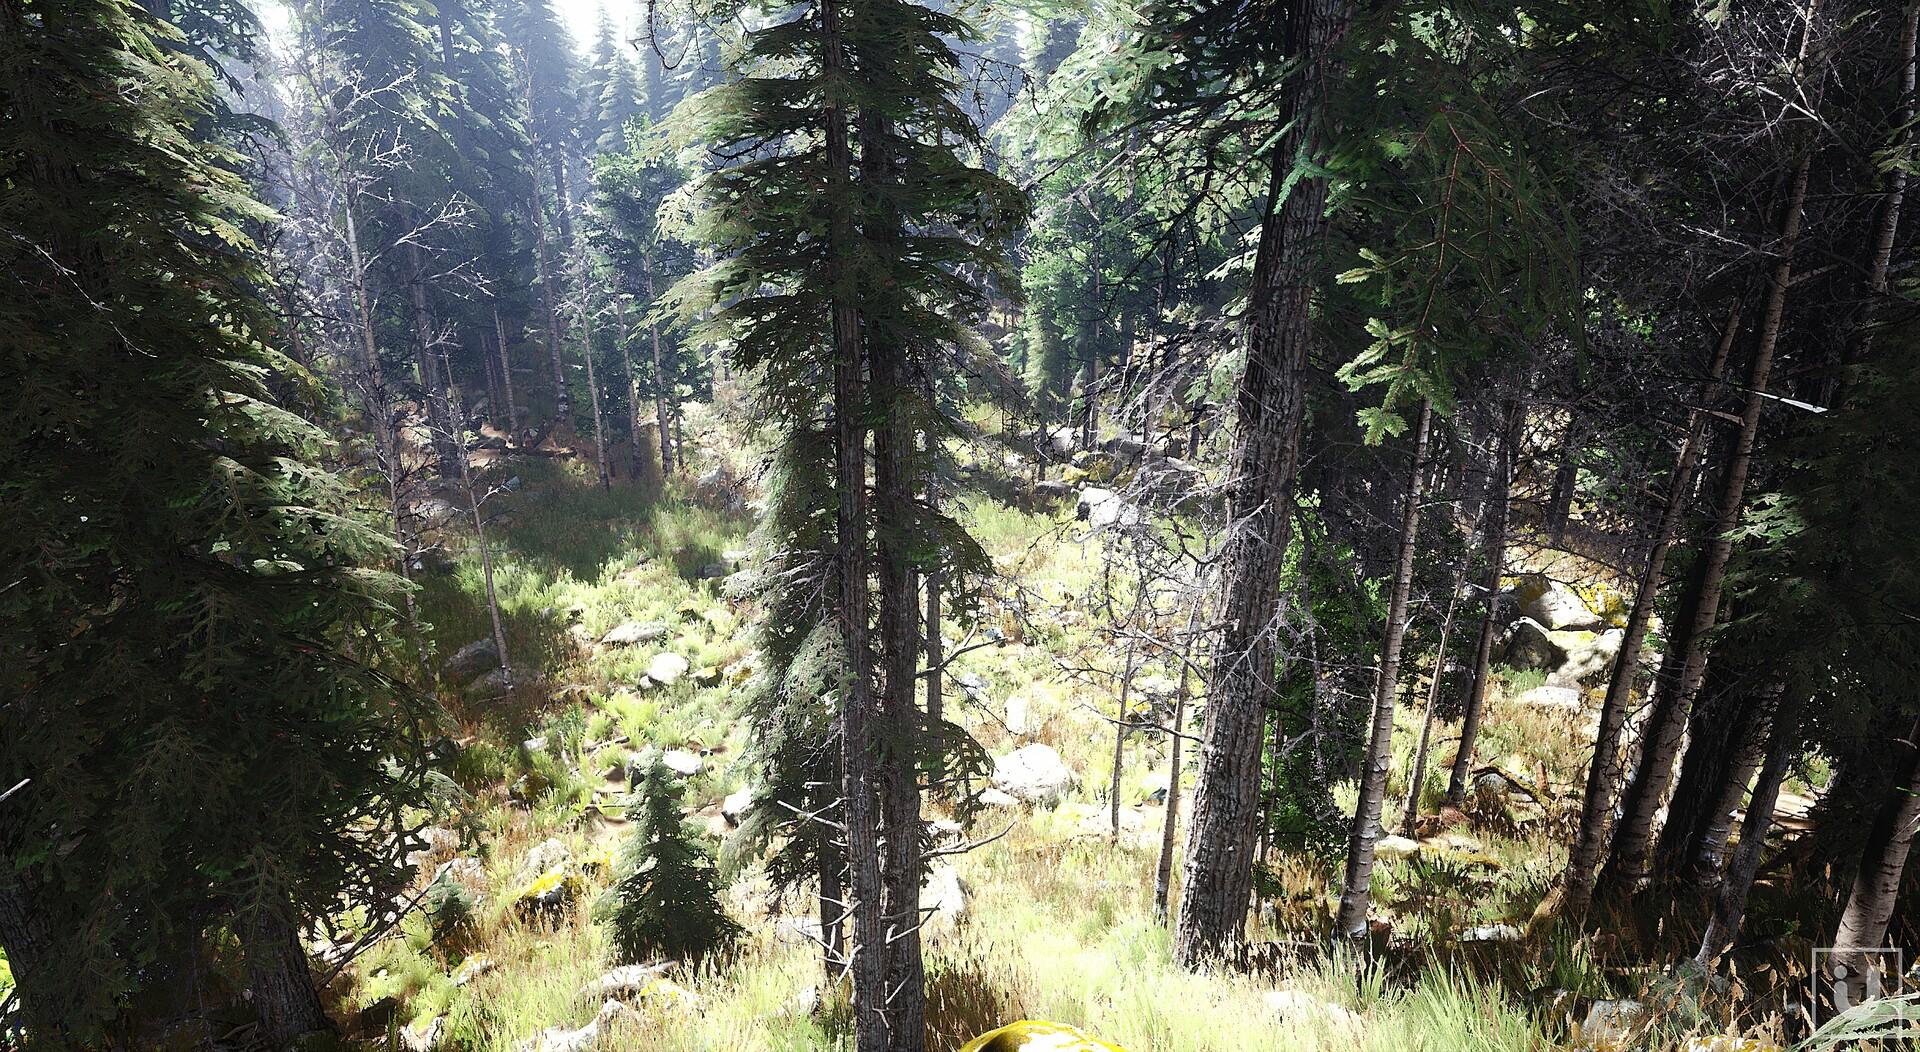 ArtStation - Unreal Engine - The Forest - Volumetric Fog and HDRI